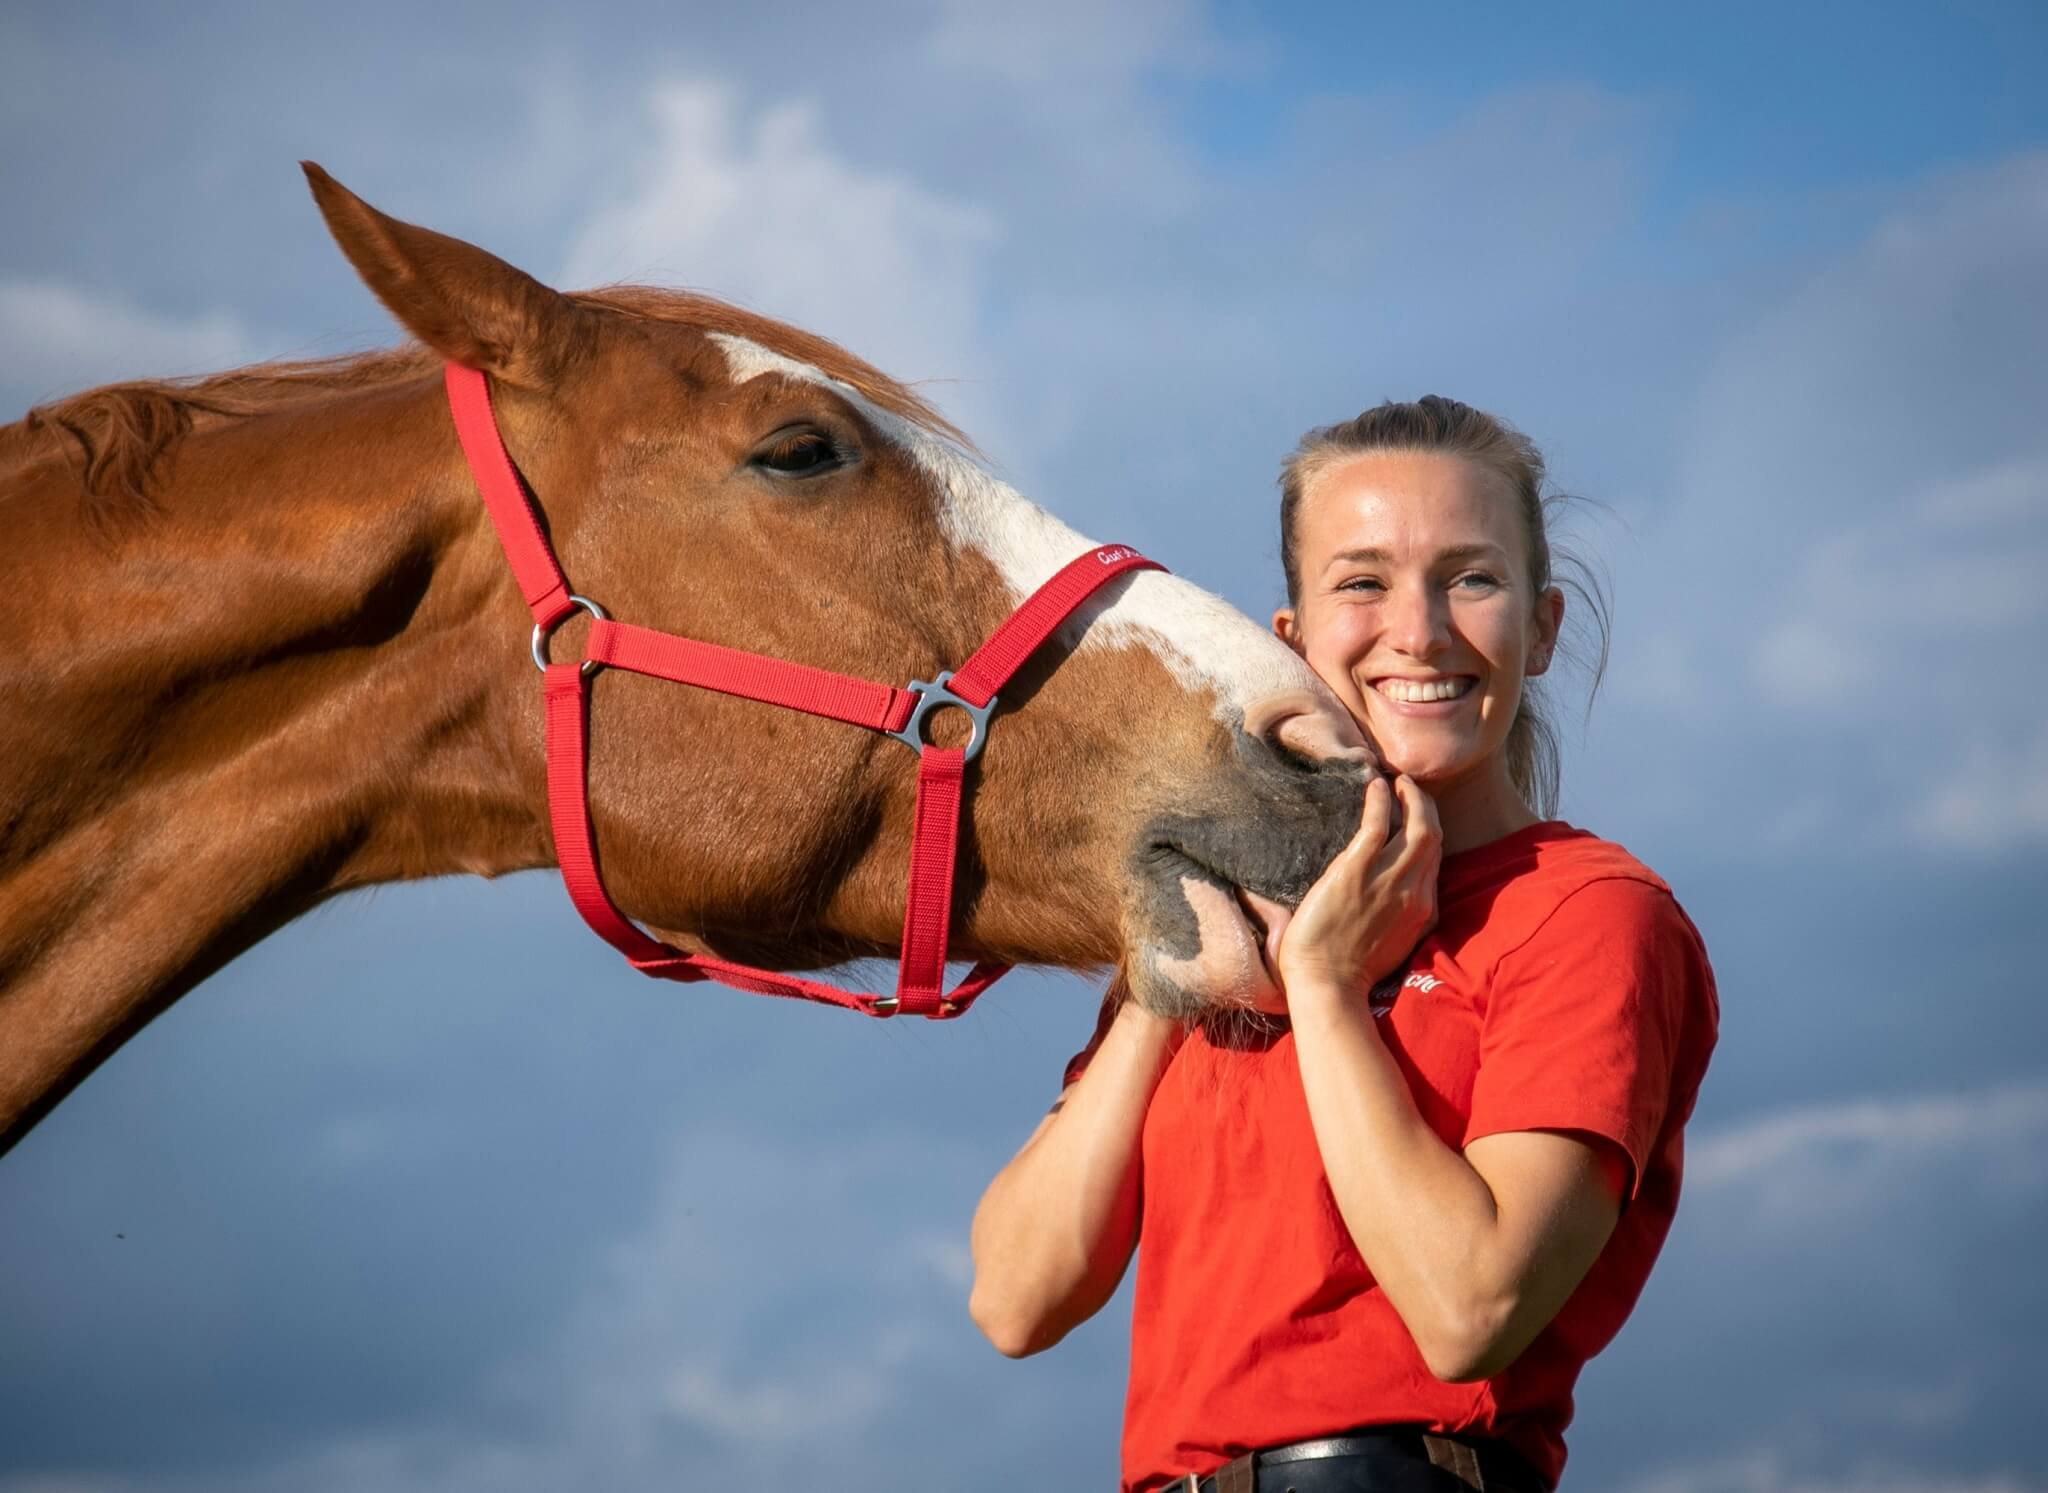 Tierpflegerin Melina mit Pferd Idefix